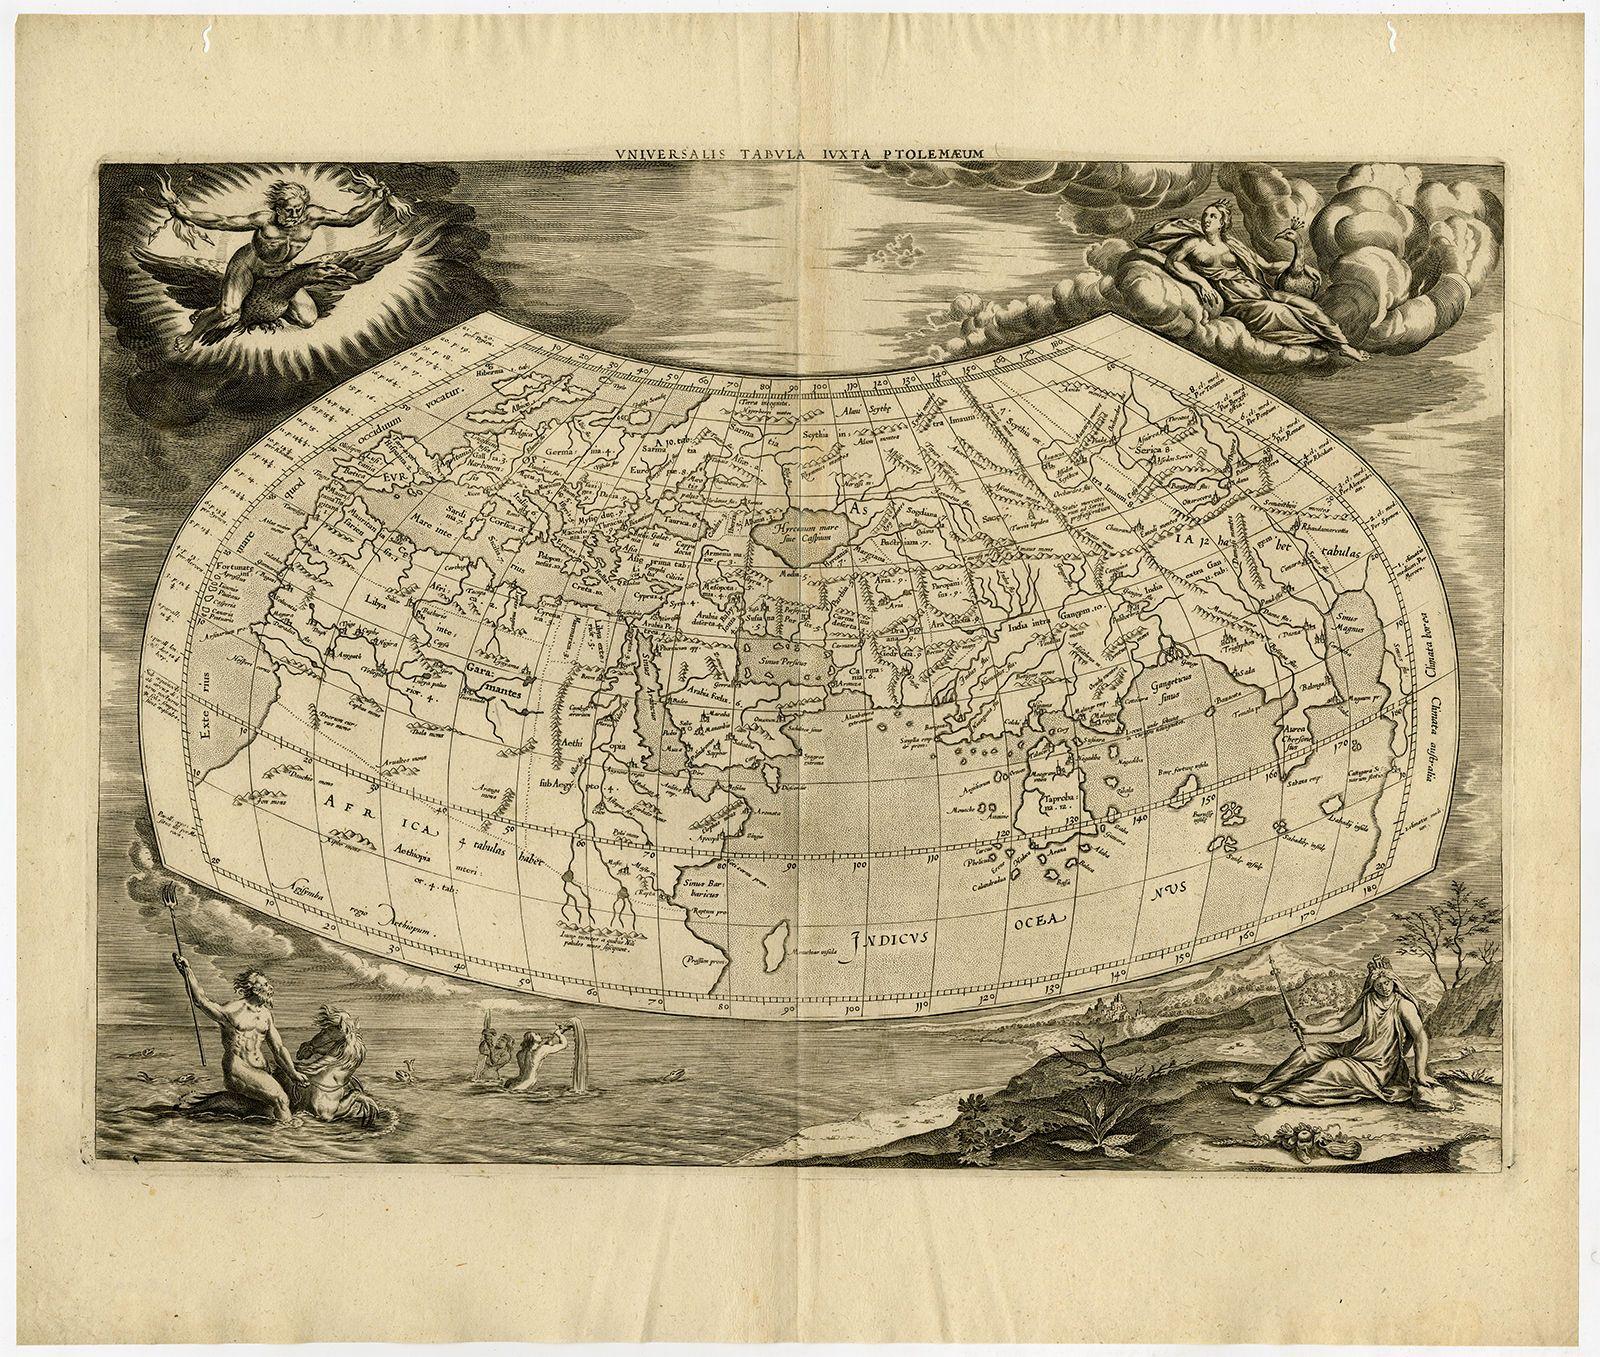 Antique print worldmap ancient world ptolemy mercator 1698 httpebayitmantique print worldmap ancient world ptolemy mercator 1698 401251276895hashitem5d6c70985fg1suaaosw44byzlld gumiabroncs Images